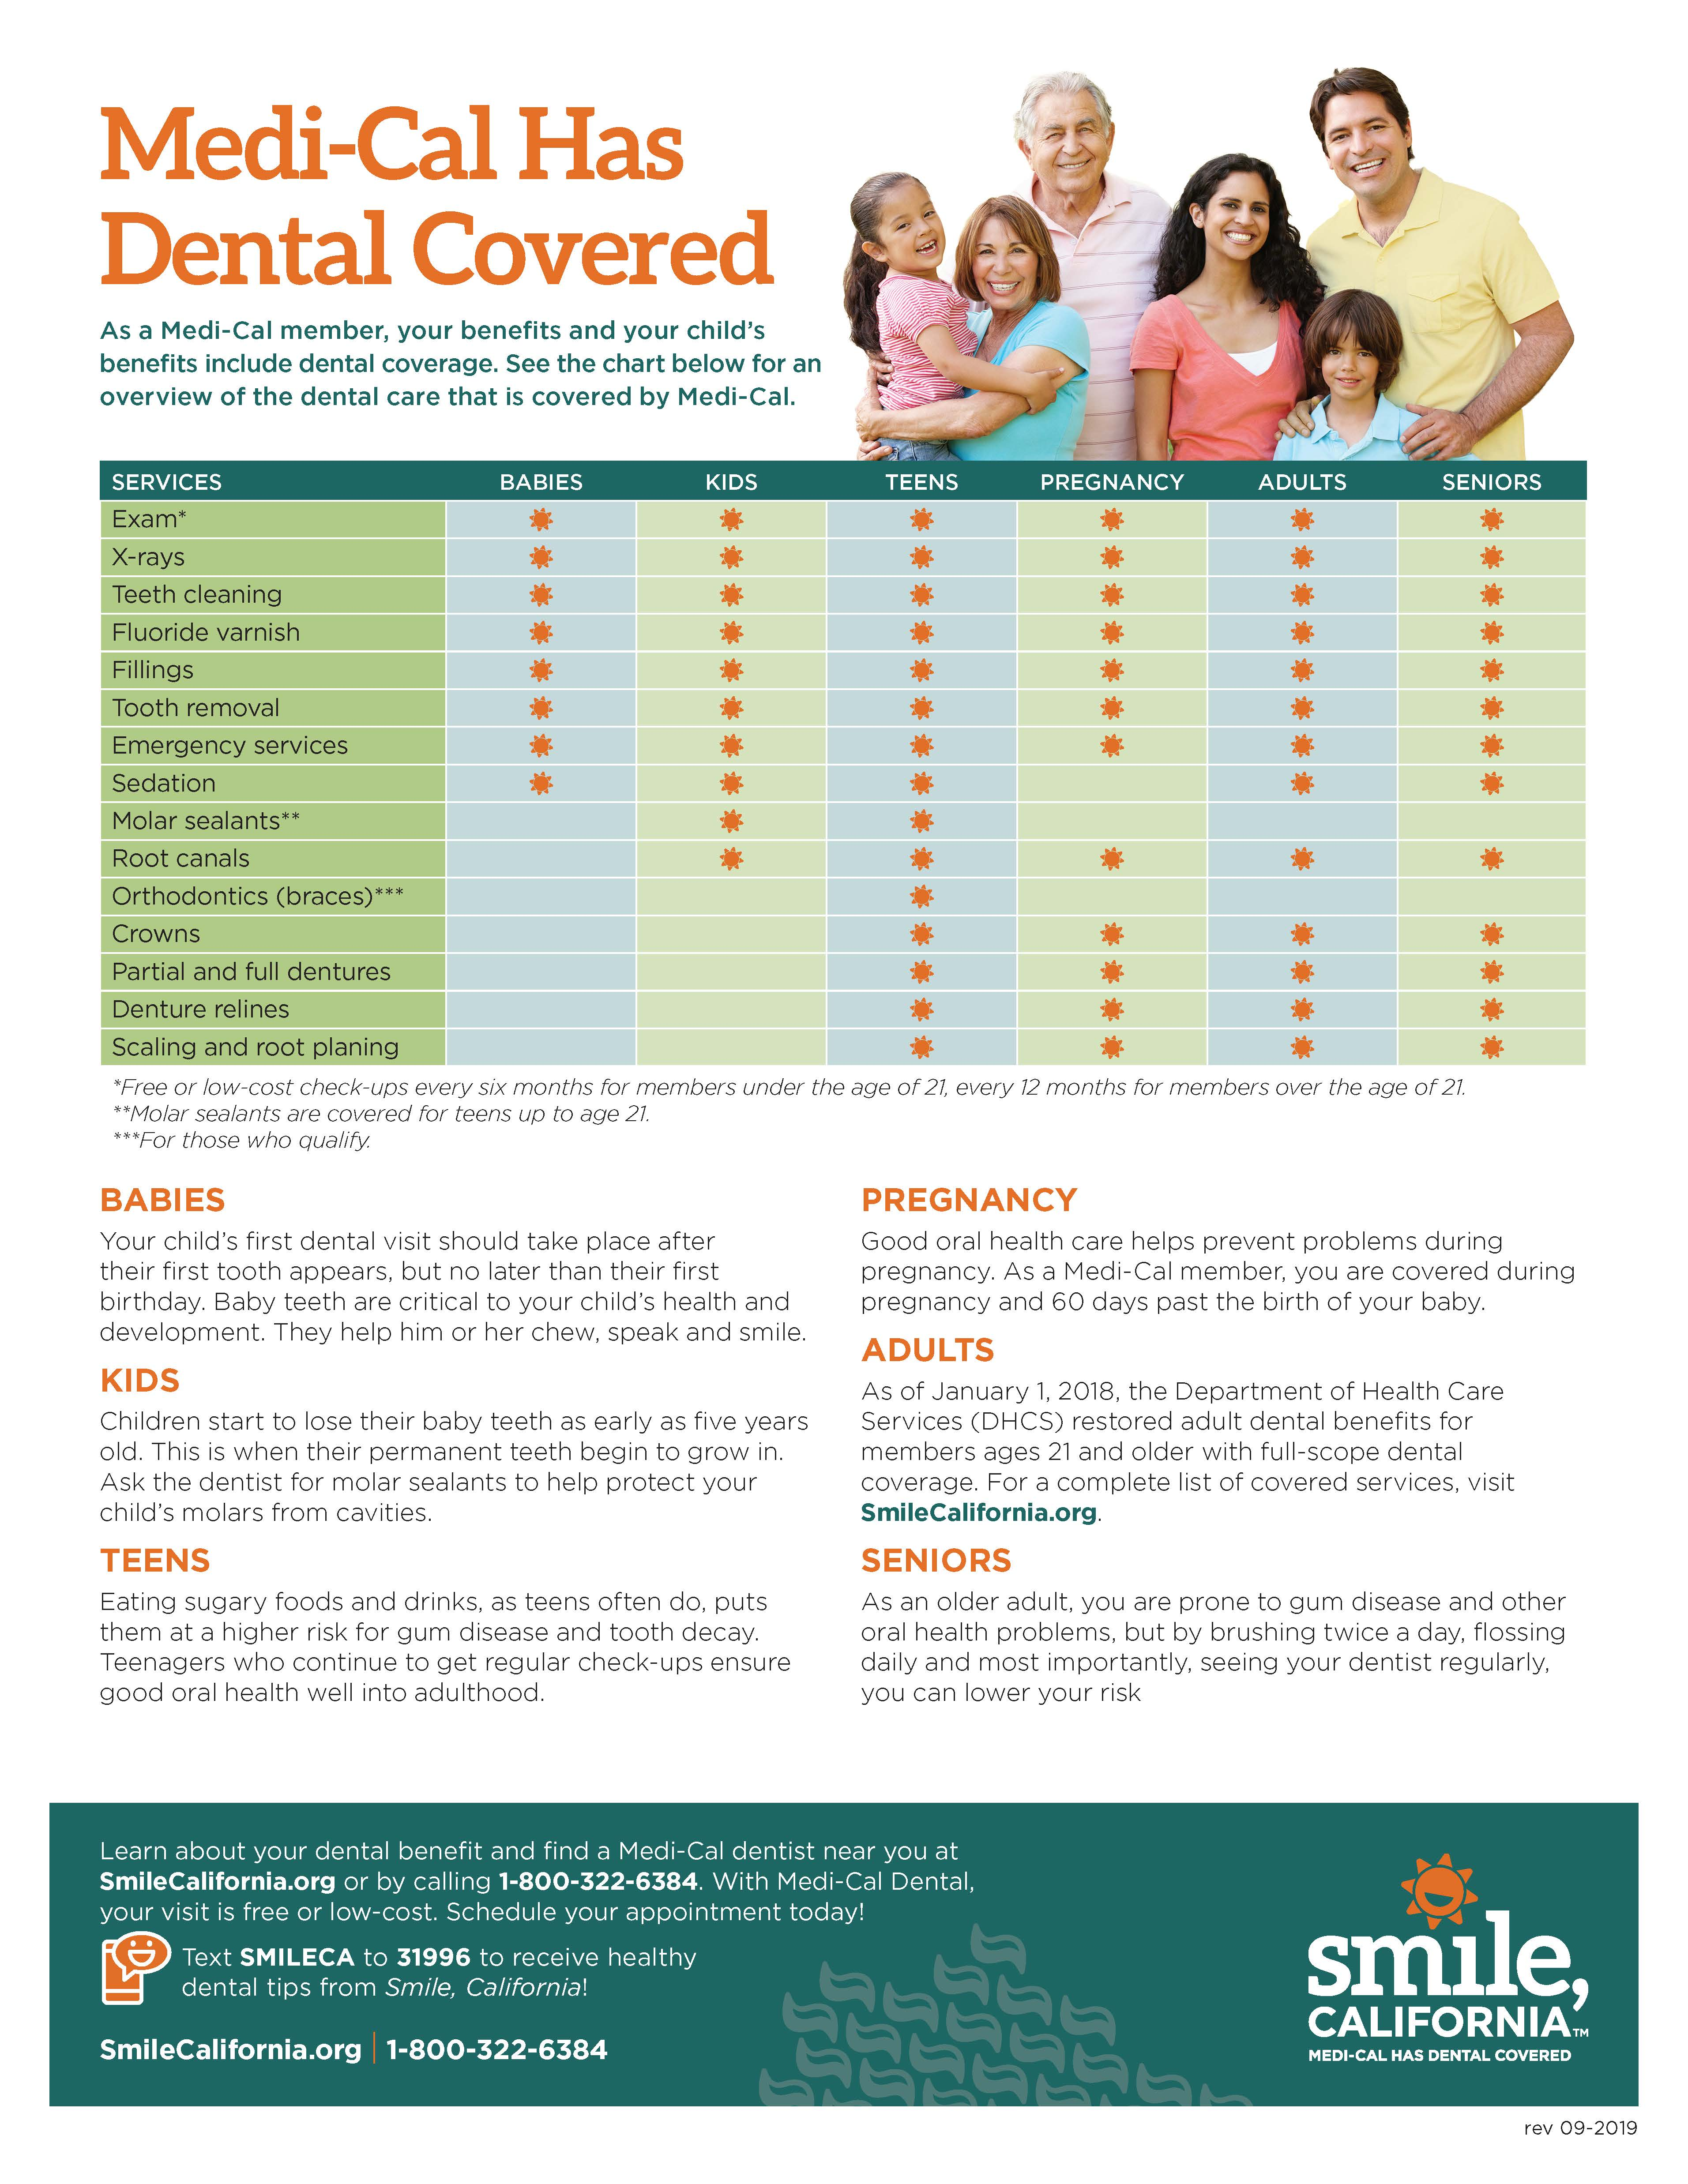 Medi-Cal has Dental Covered worksheet, click for link to .pdf